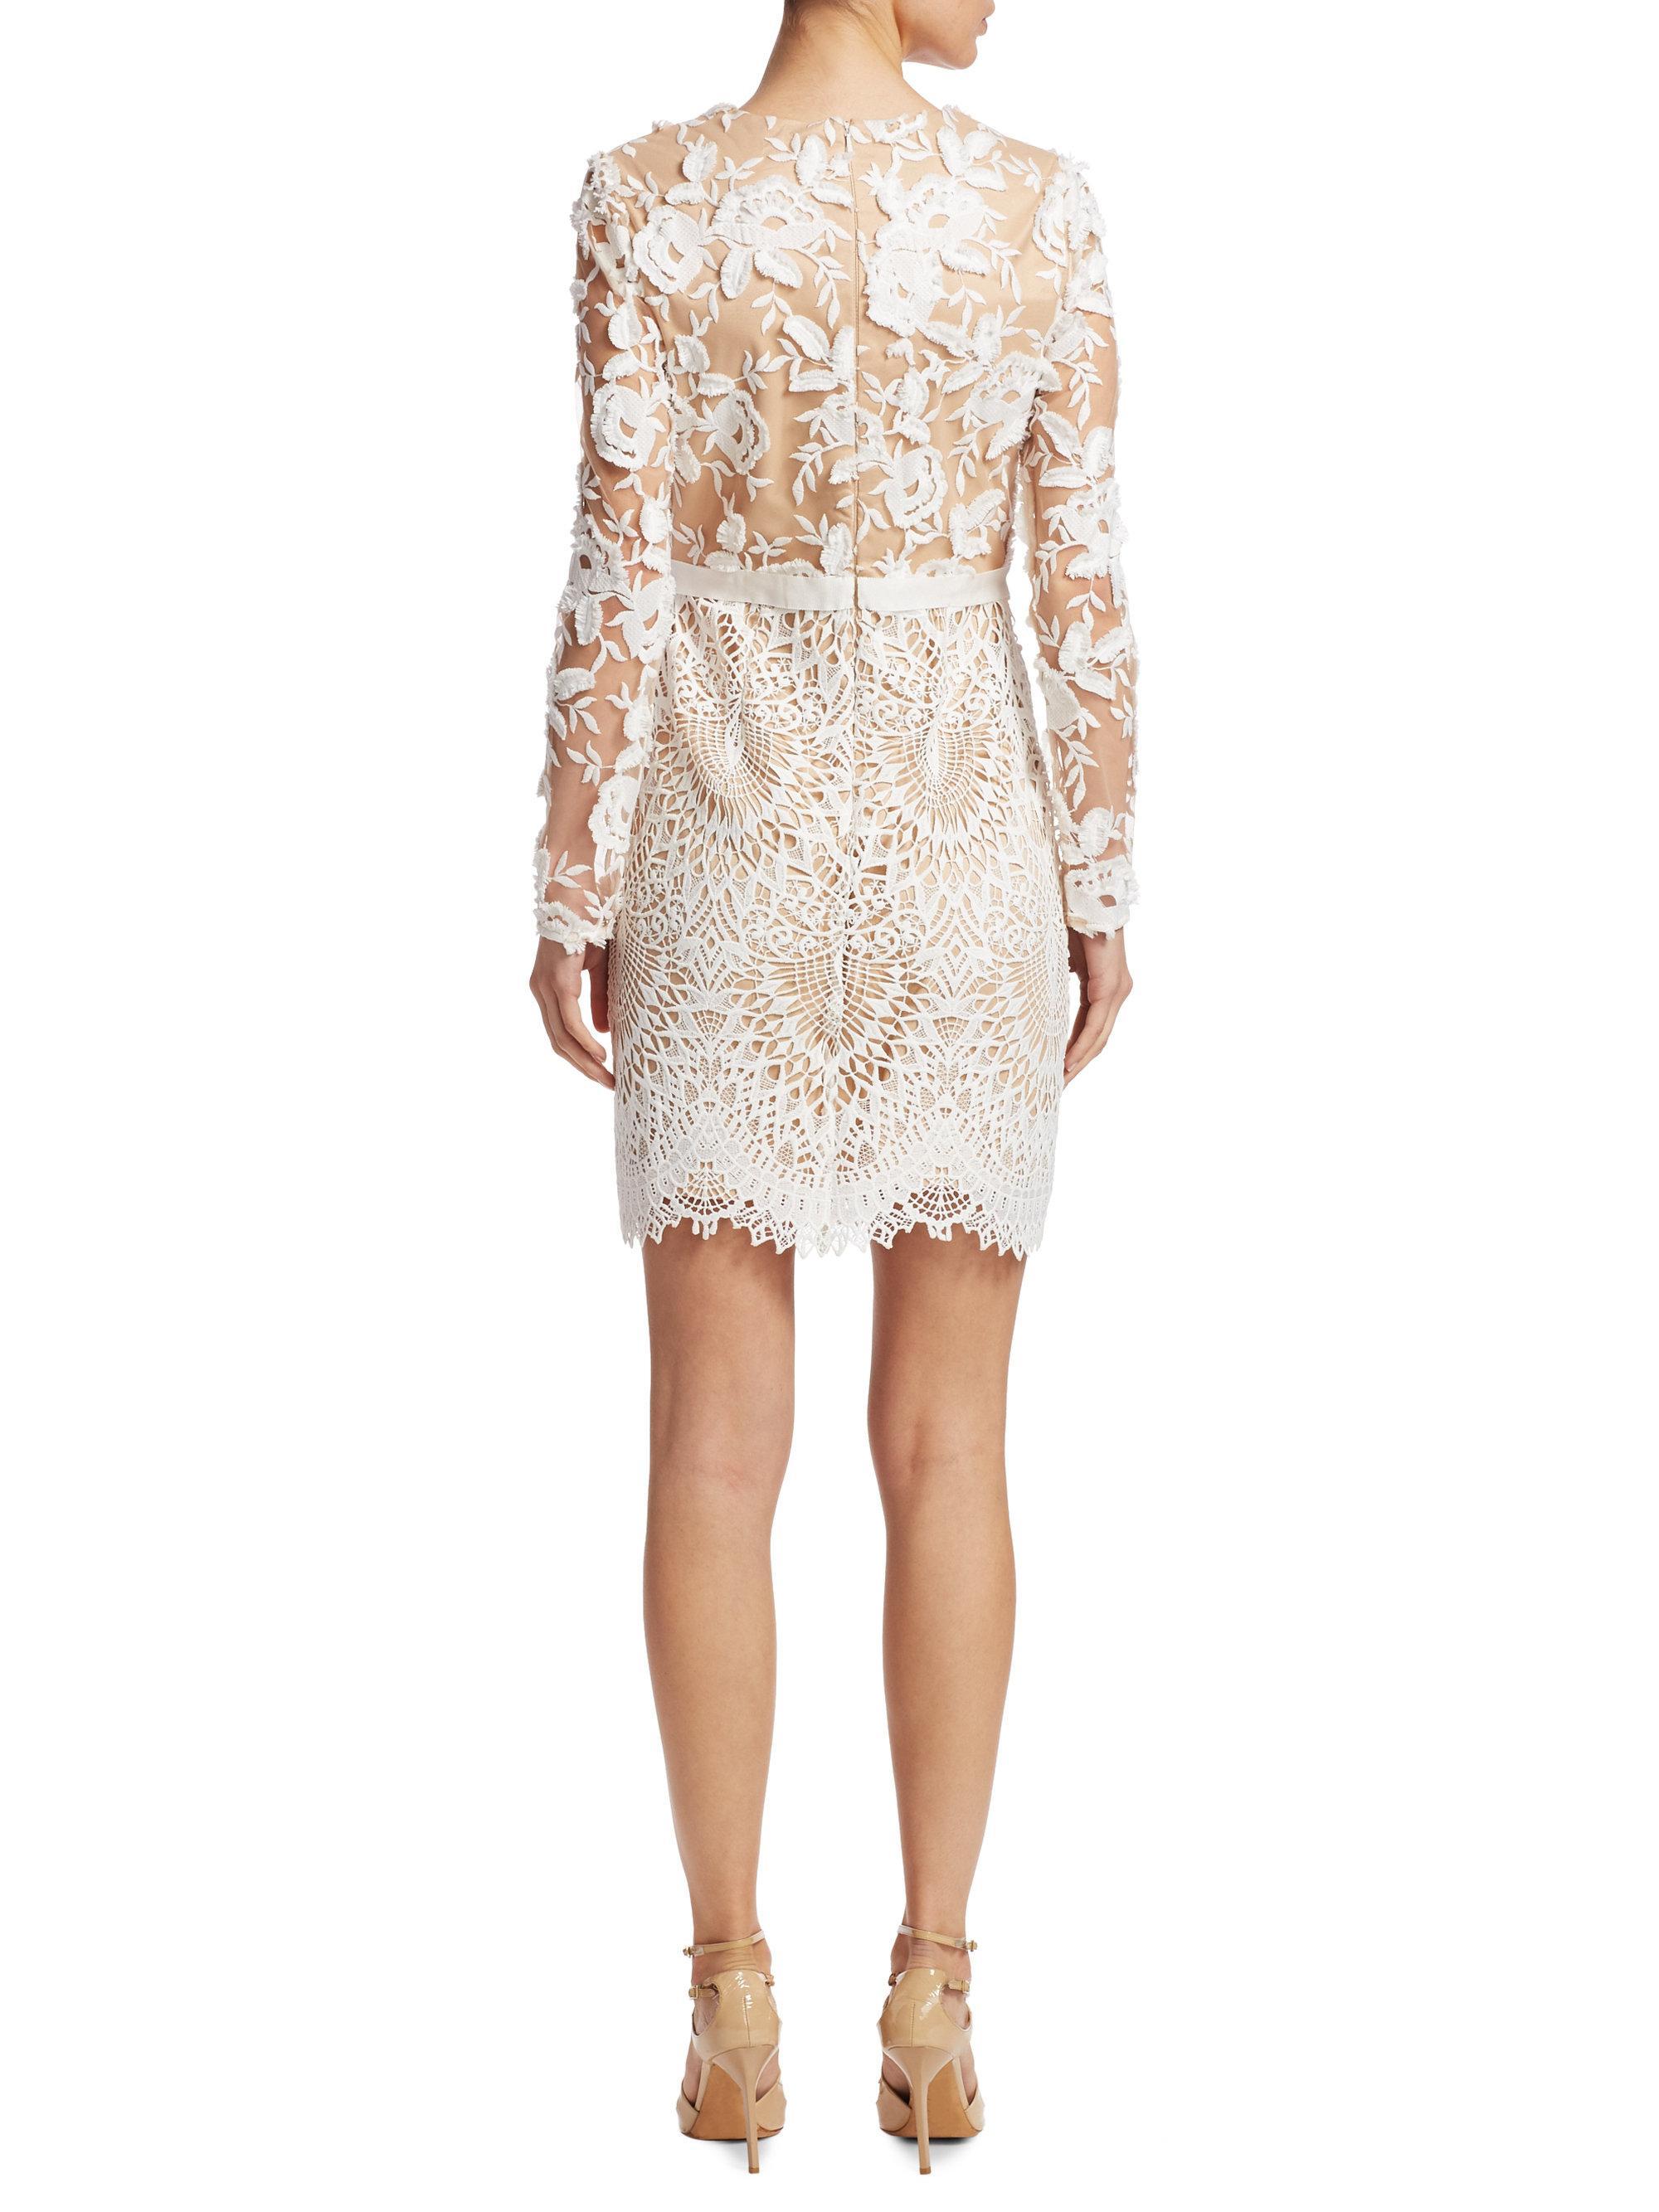 Lyst Ml Monique Lhuillier Lace Cocktail Dress In White